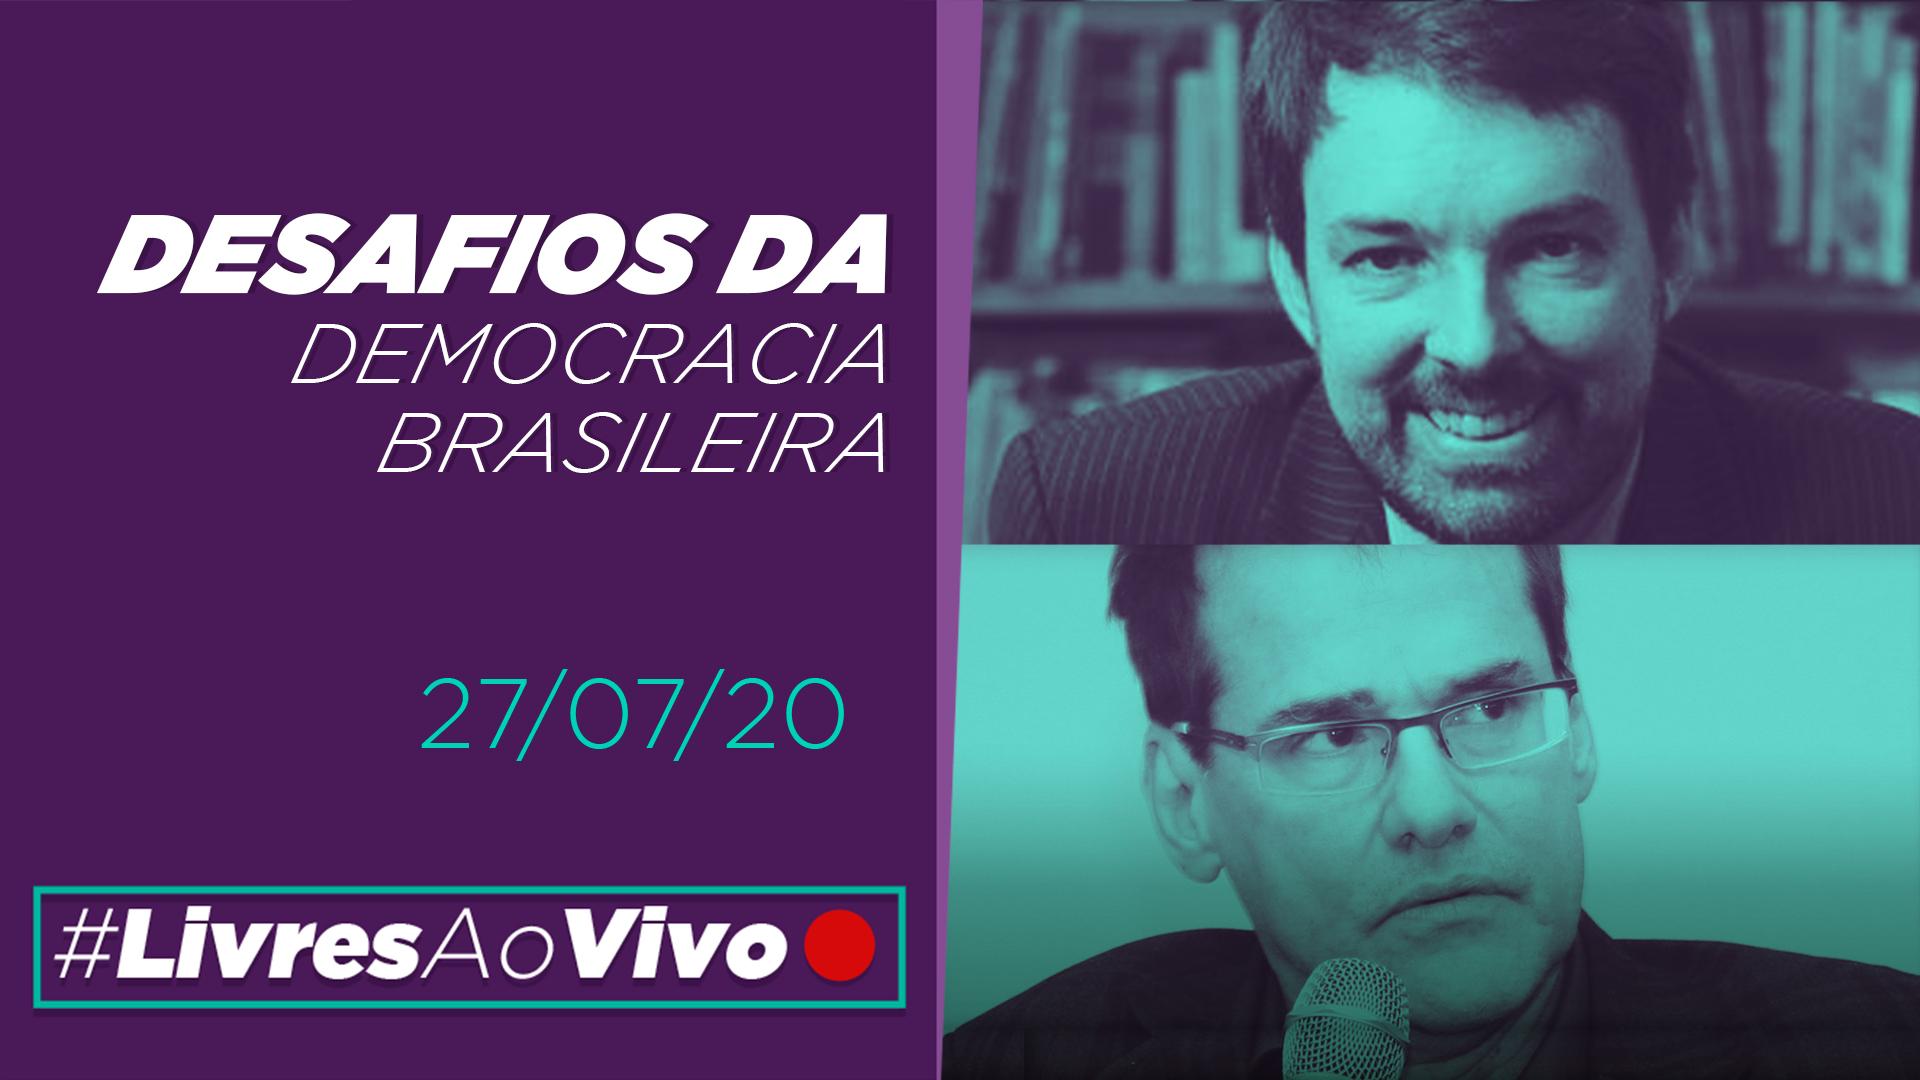 Livres Ao Vivo – Desafios da democracia brasileira | Debate com Fernando Schuler e Marcus André Mello